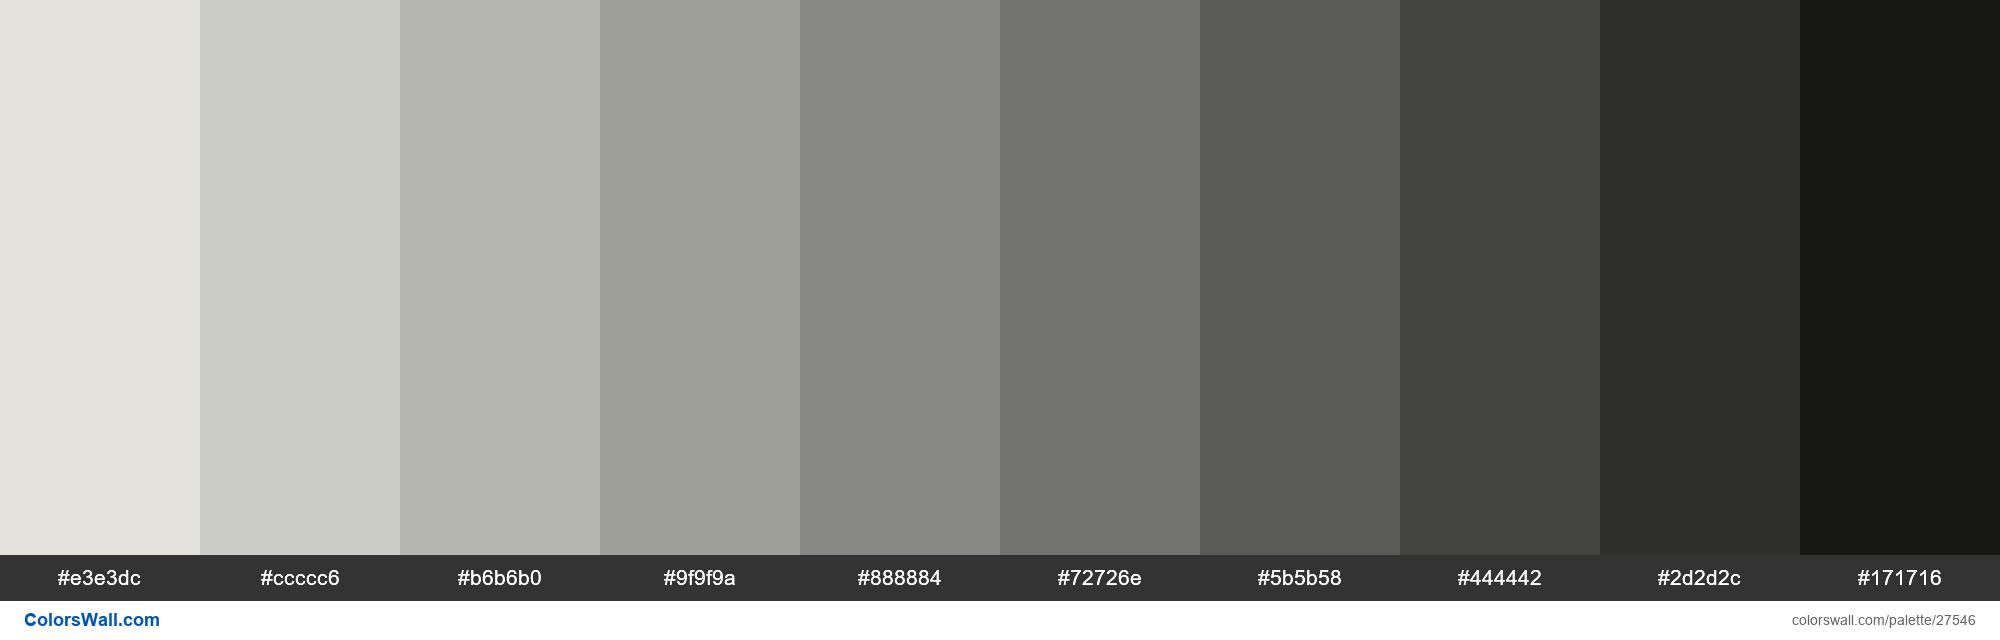 Shades Of Snow Drift Color E3e3dc Hex Hex Colors Travertine Colors Spring Colors